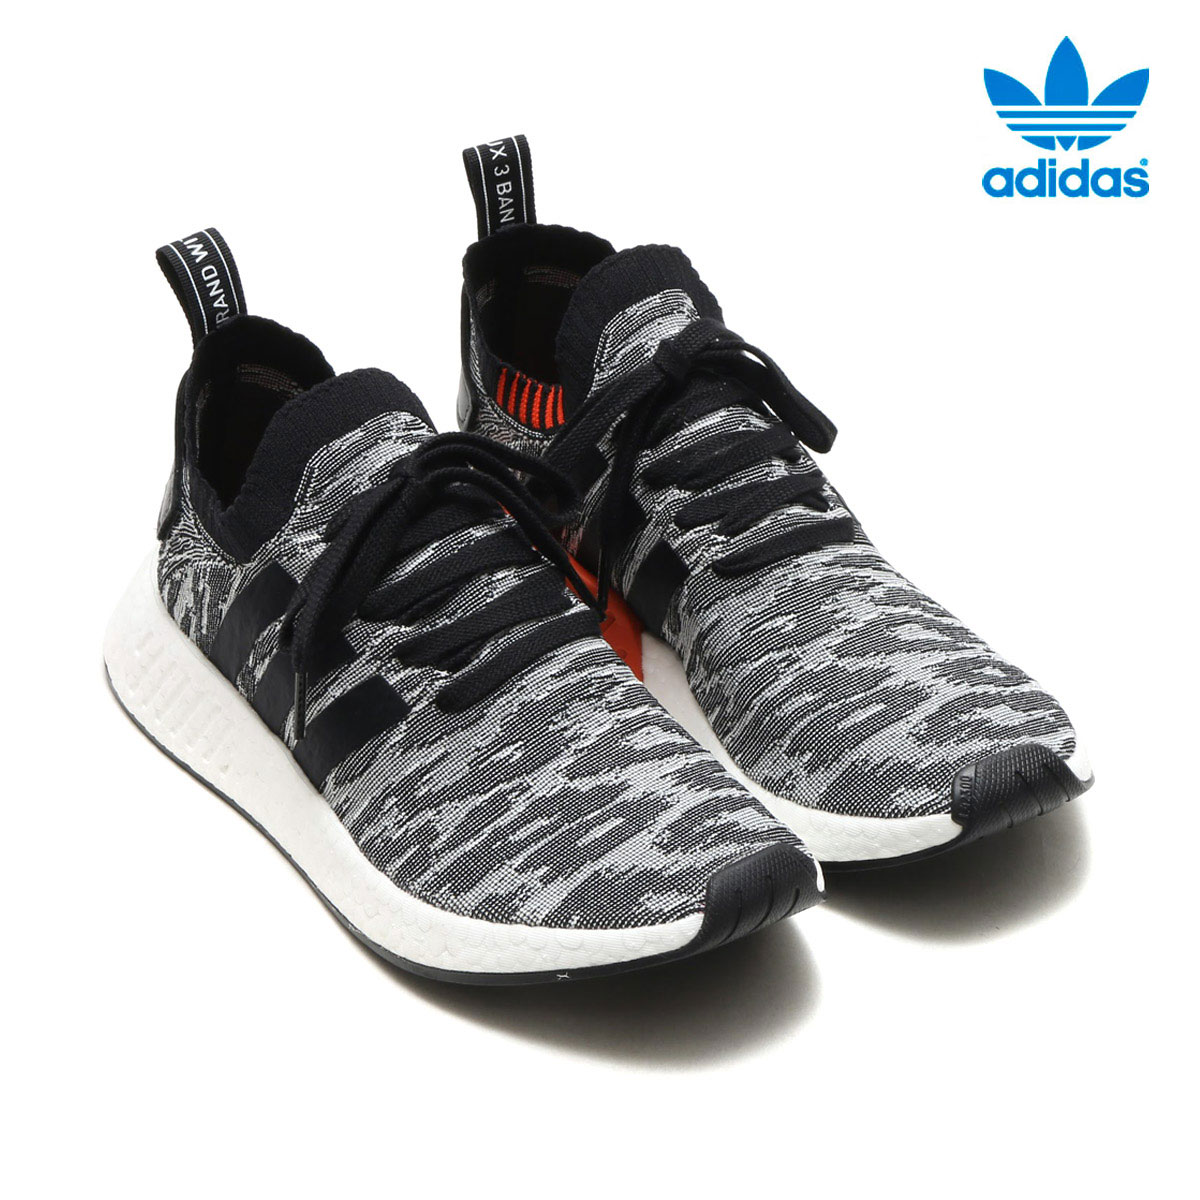 40fa51aae63e0 adidas Originals NMD R2 PK (Adidas originals nomad) (CORE BLACK CORE BLACK)  17FW-I